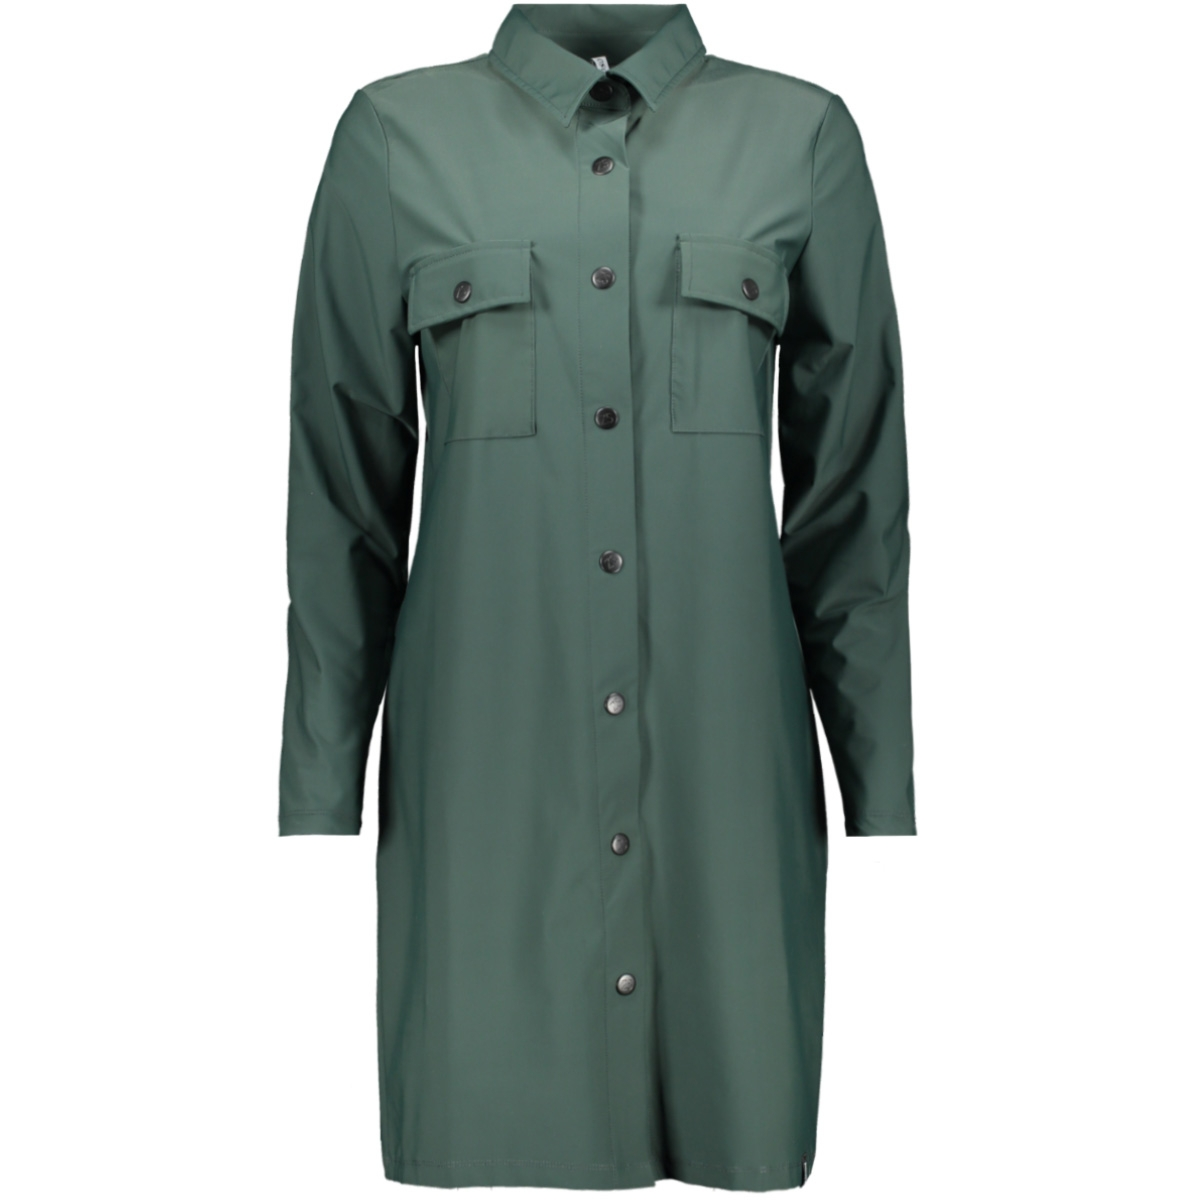 terry winter  long blouse 195 zoso jurk forest